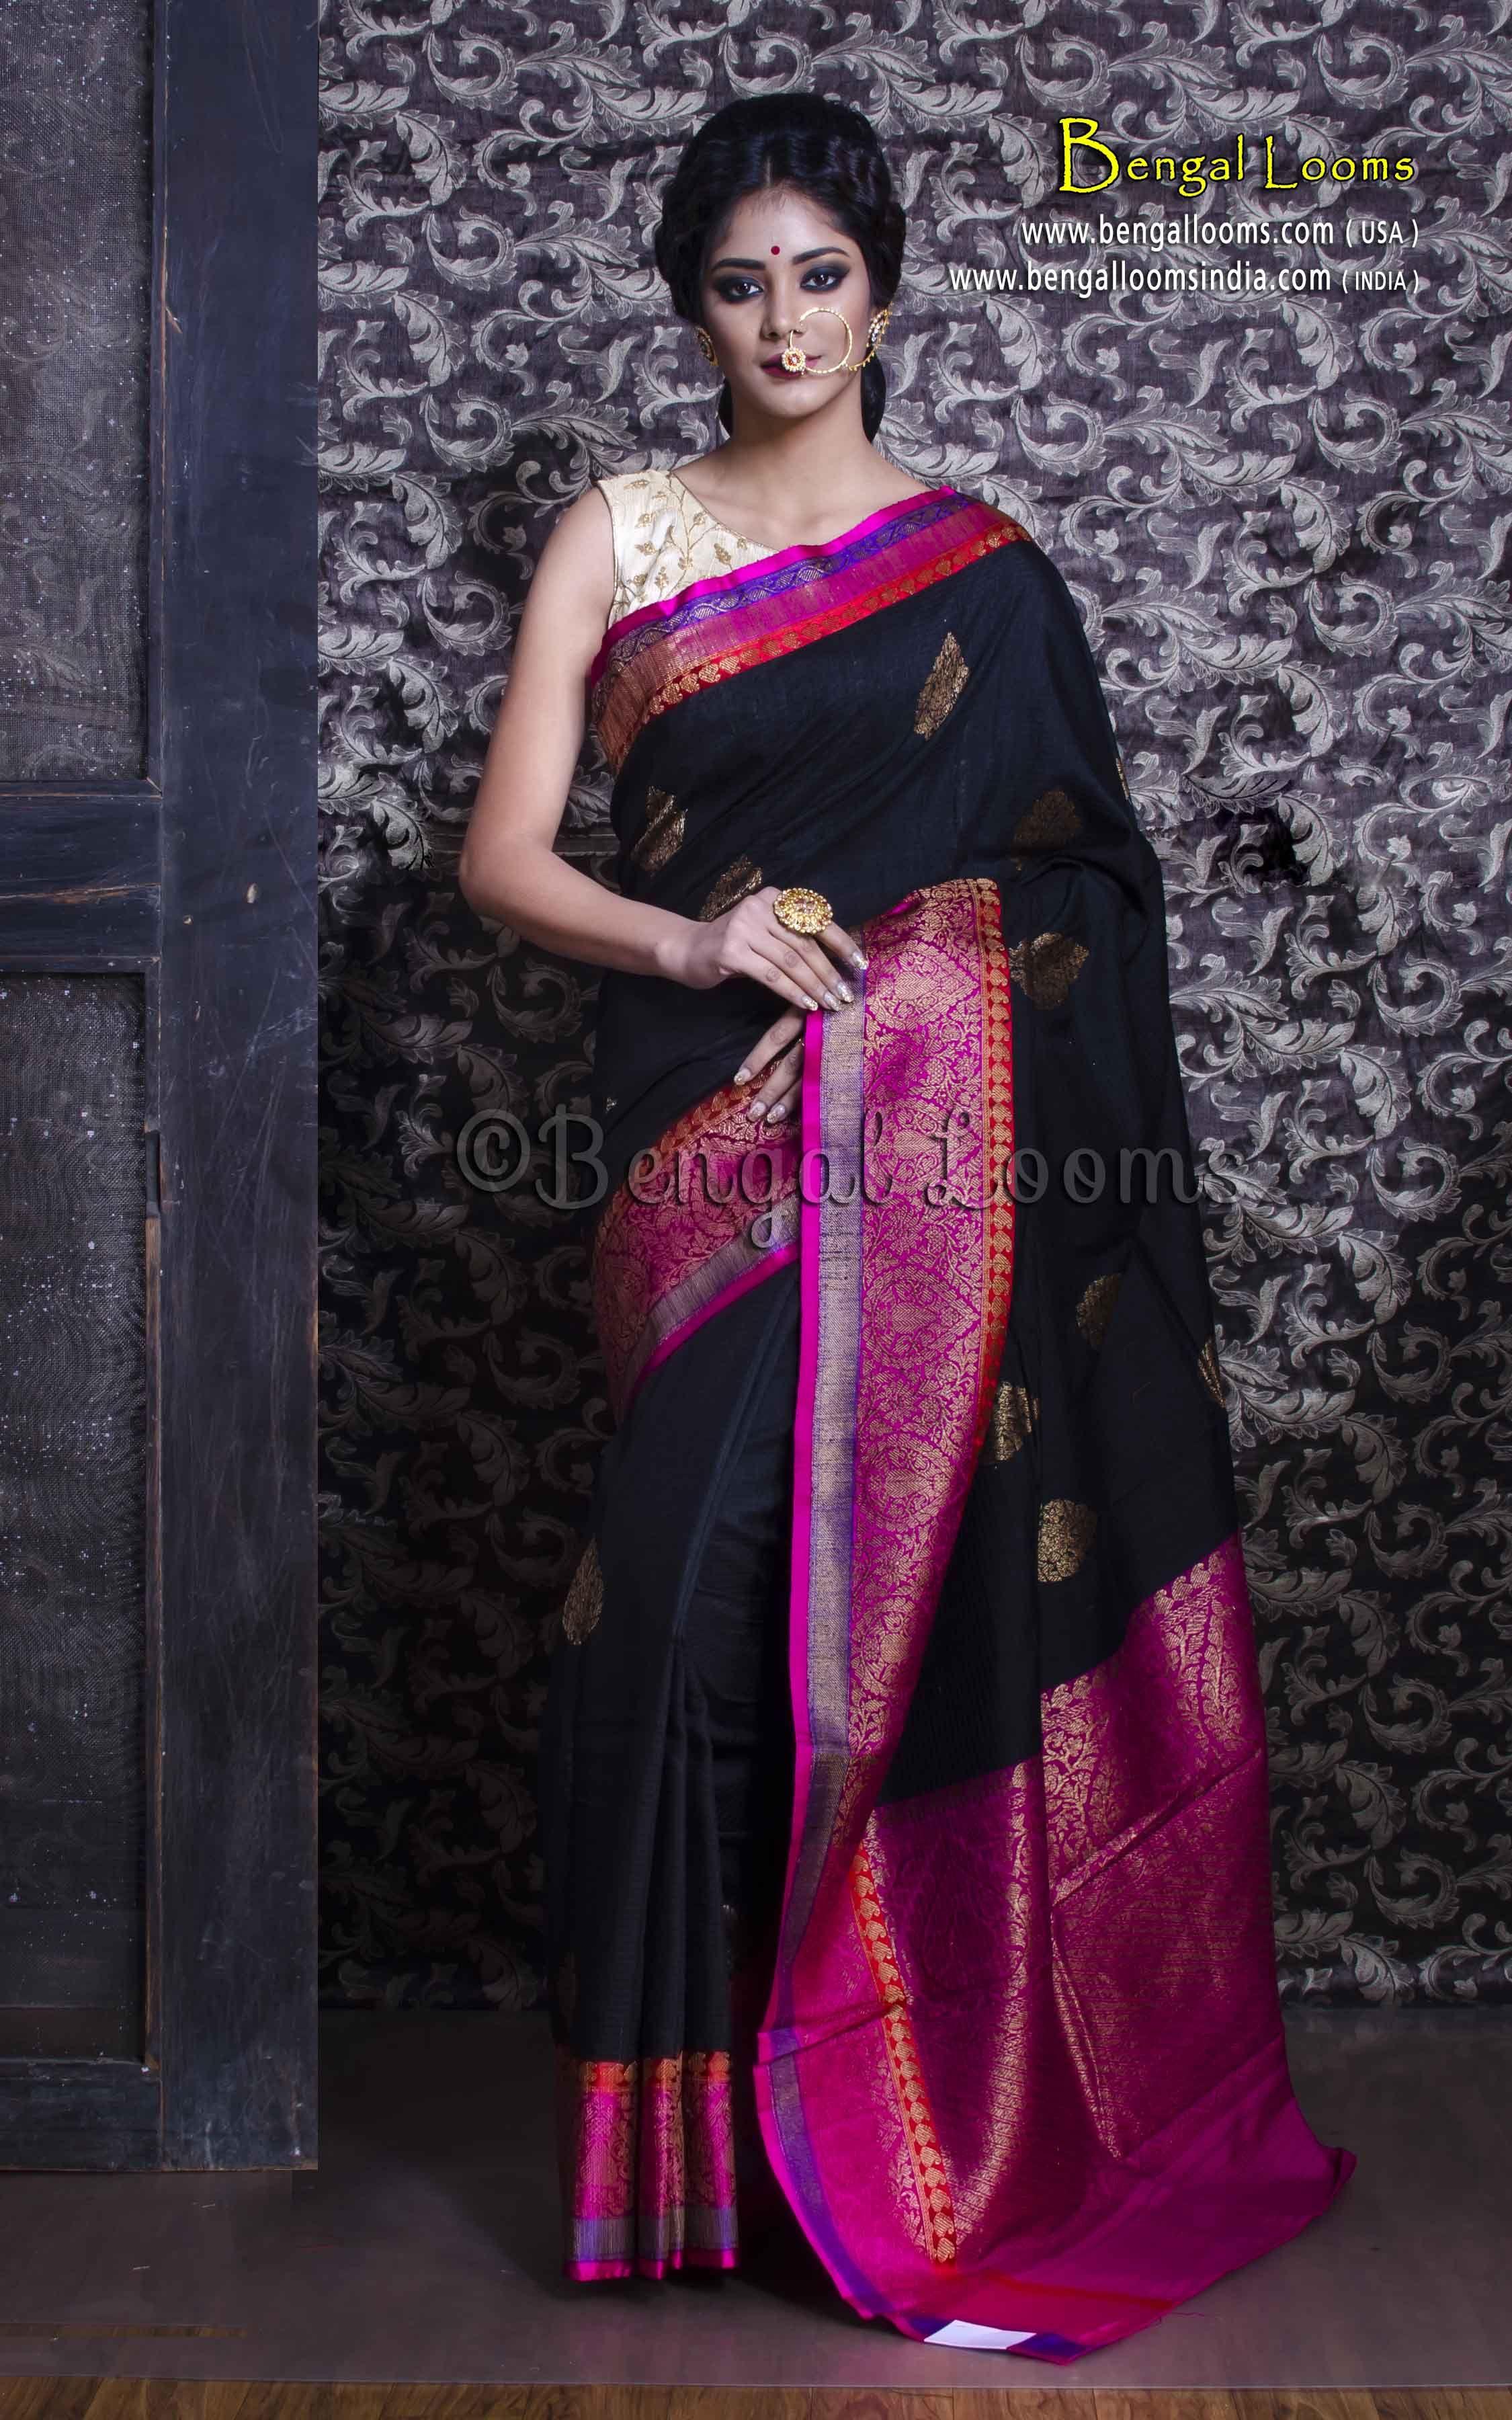 f5bd5e15a0 Pure Handloom Tussar Silk Banarasi Saree in Black and Magenta ...